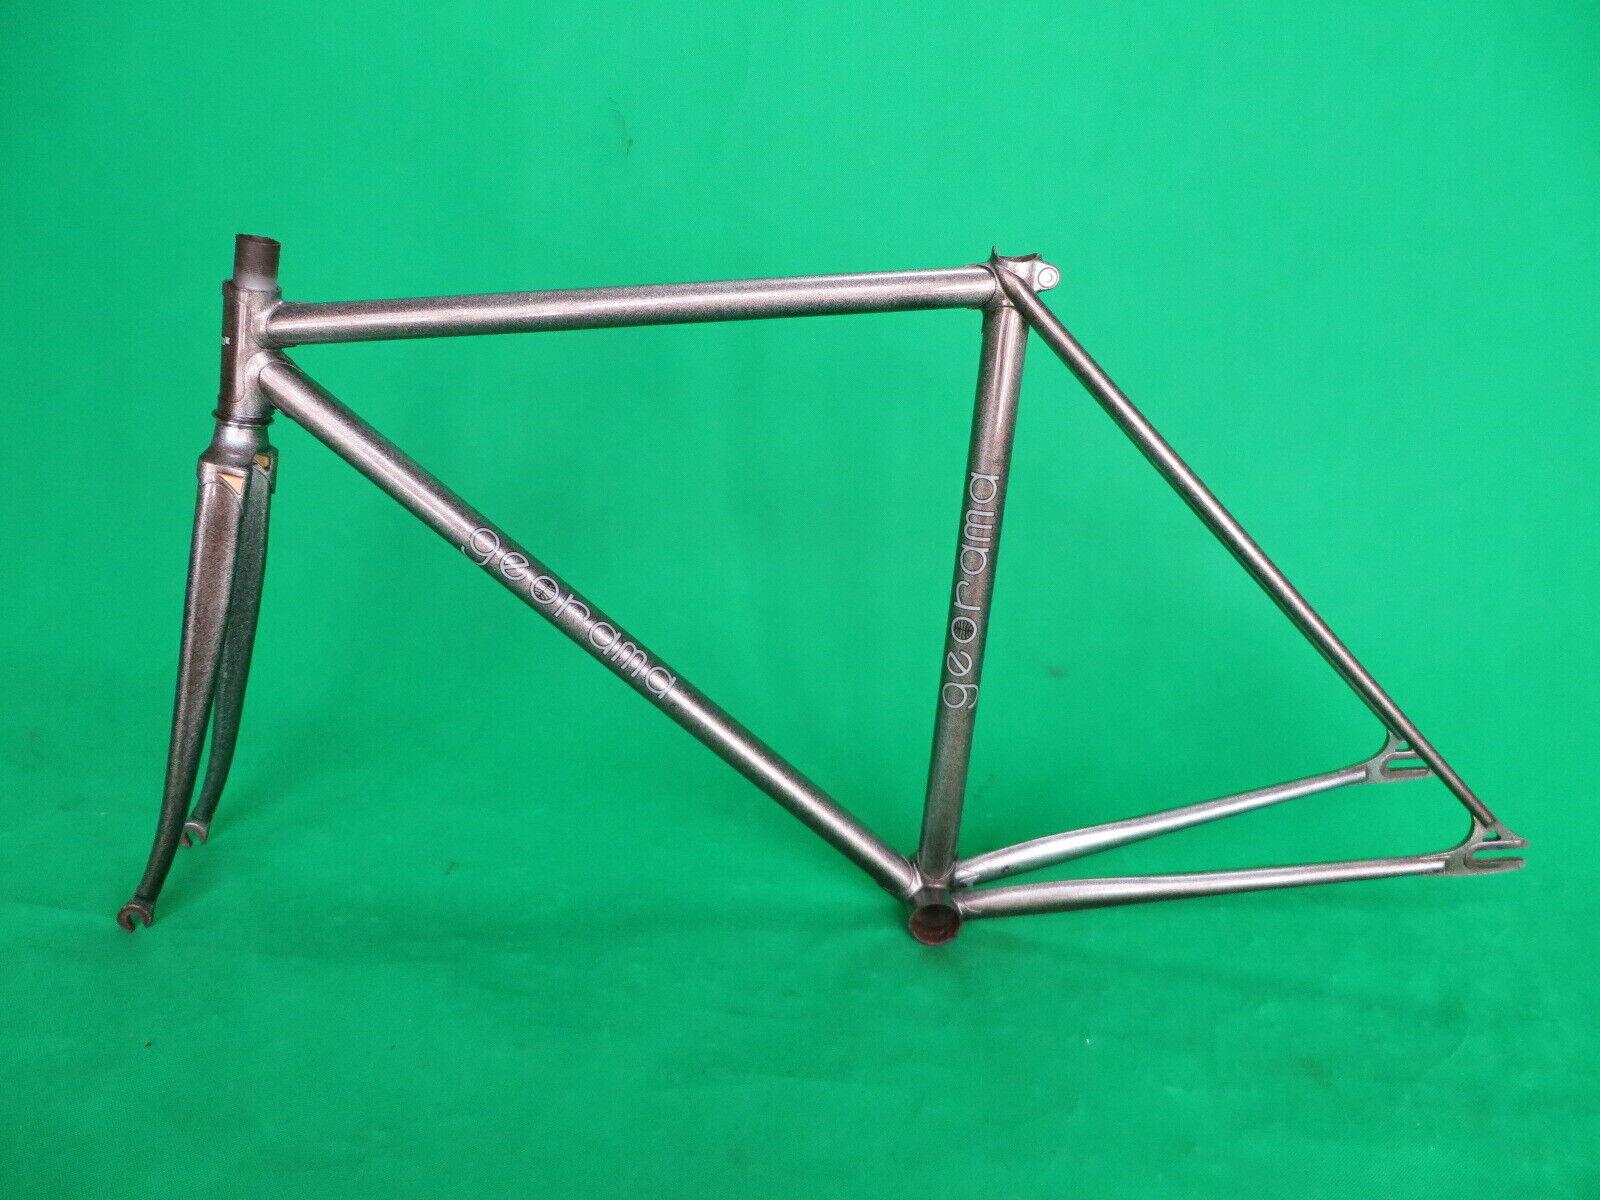 Georama NJS Keirin Frame Conjunto de pista de bicicleta de una sola velocidad FG pists 47.5cm